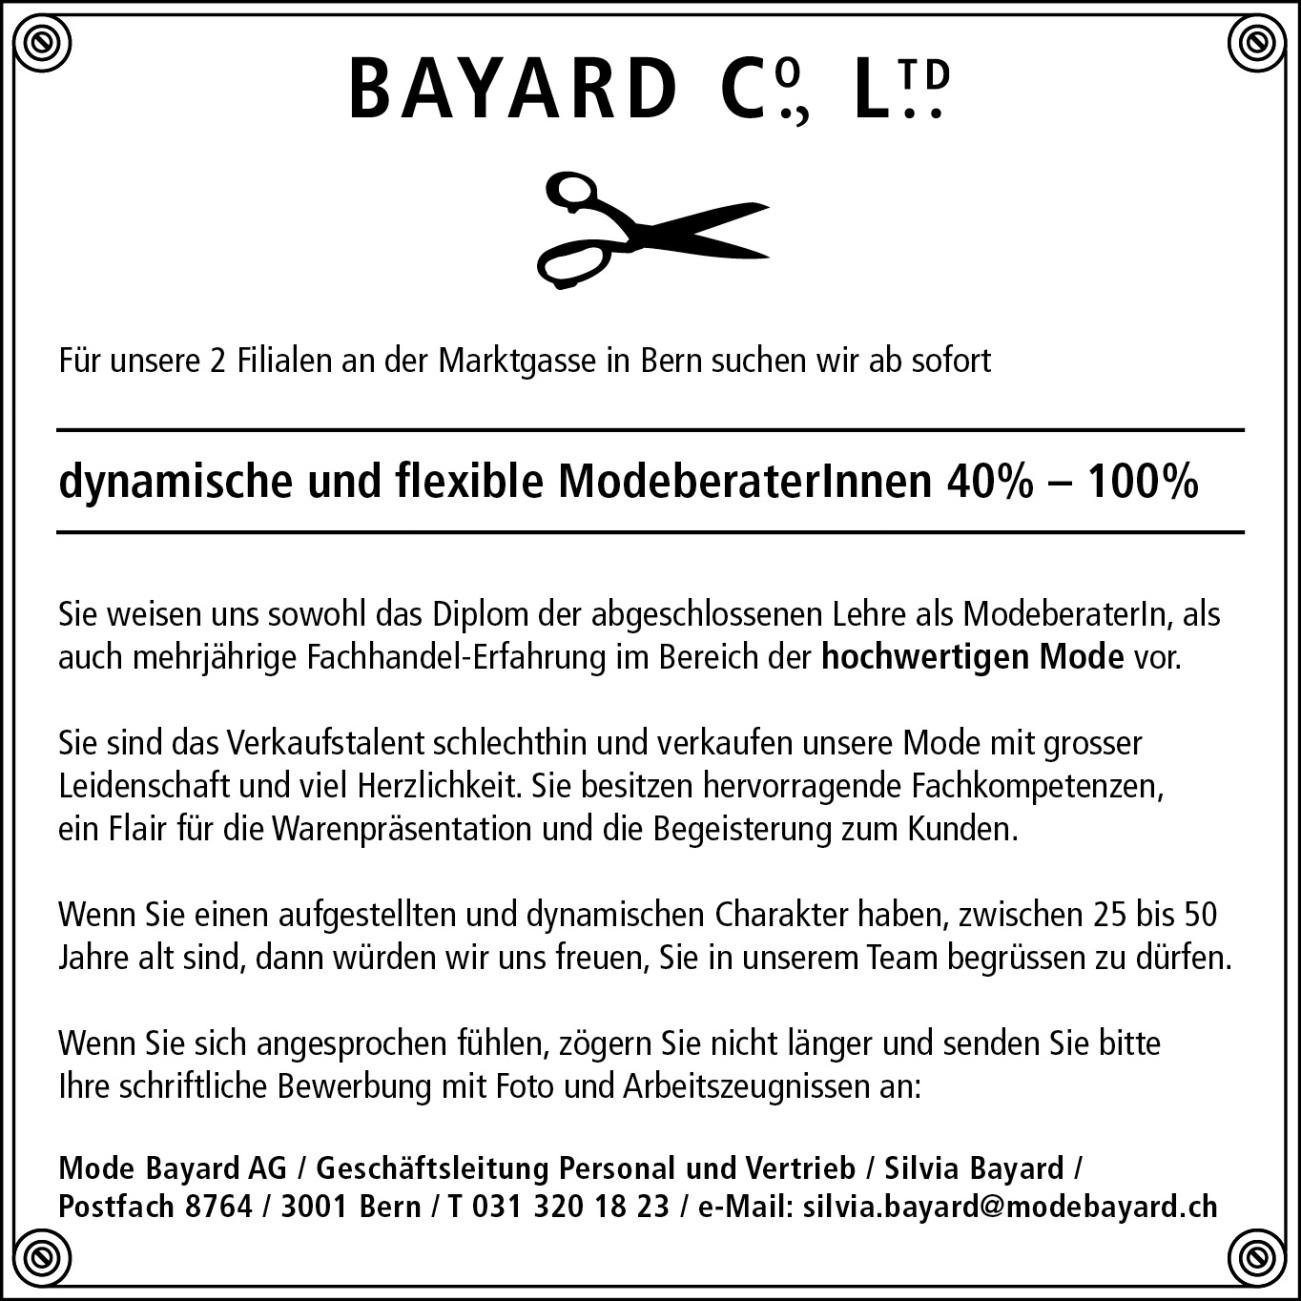 © Mode Bayard Group - Stelleninserat - 115.5 x 115.5 - 80 mm - V02